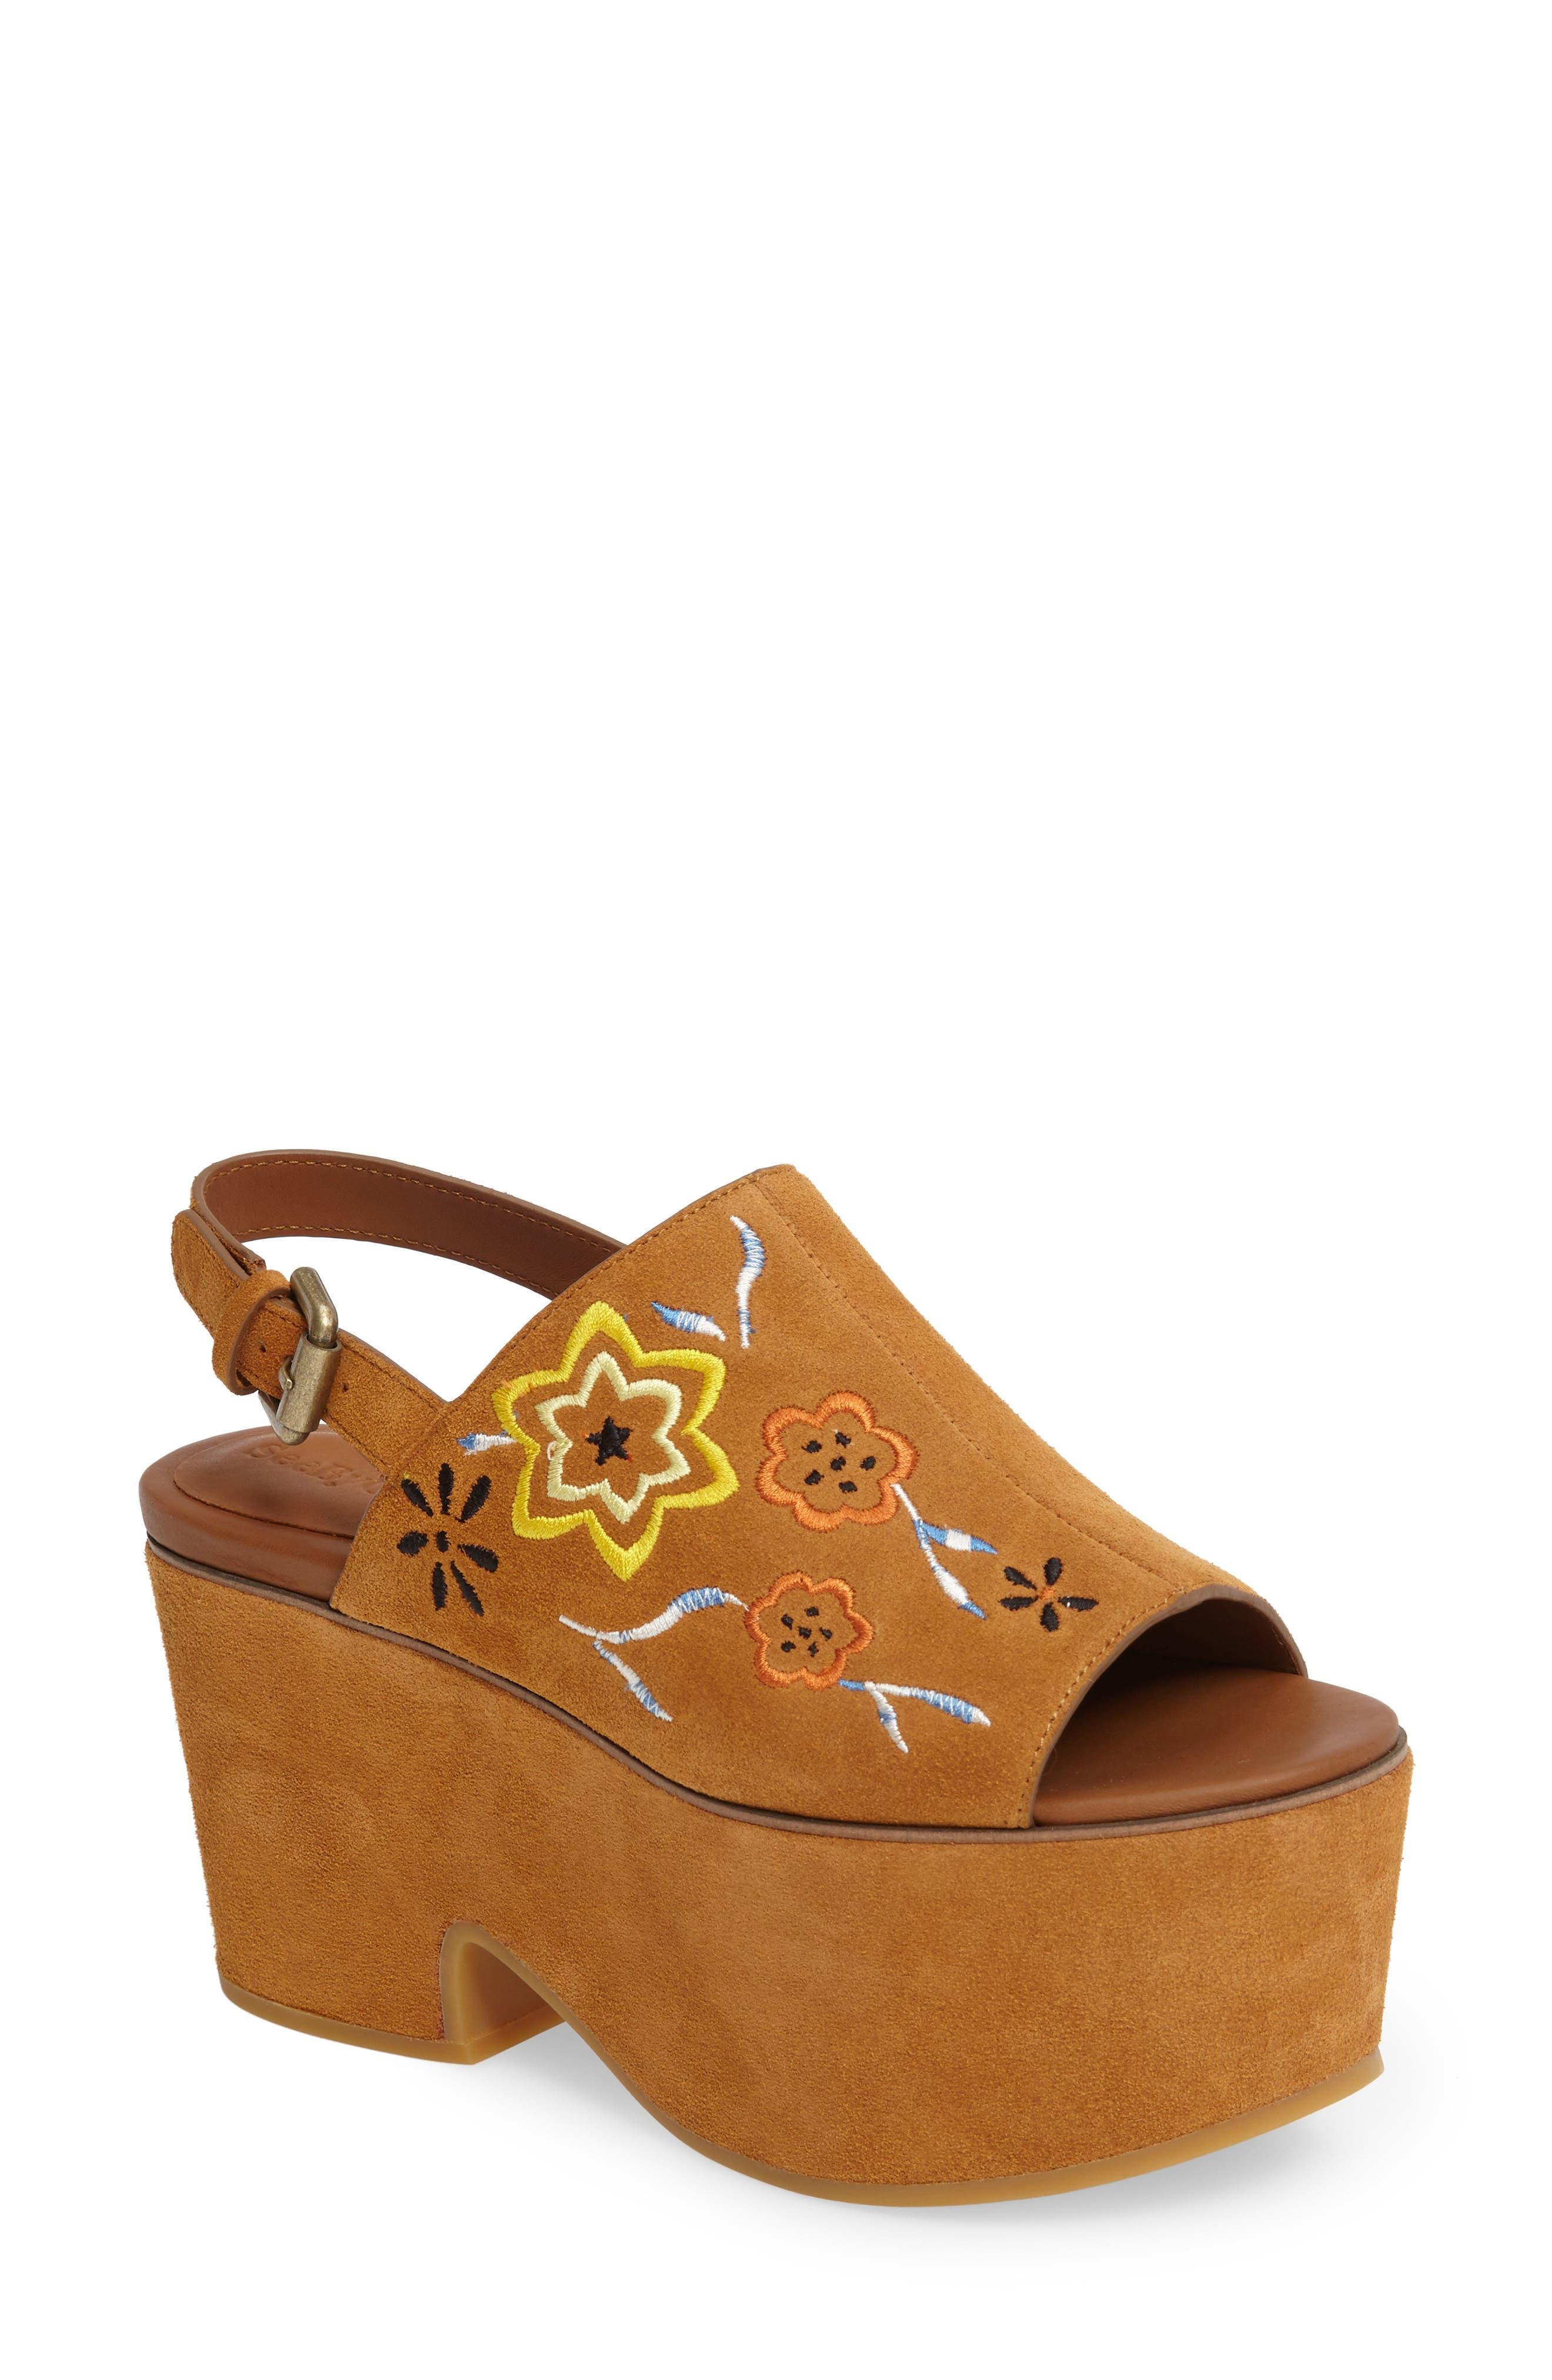 Alternate Image 1 Selected - See by Chloé Dakota Platform Sandal (Women)